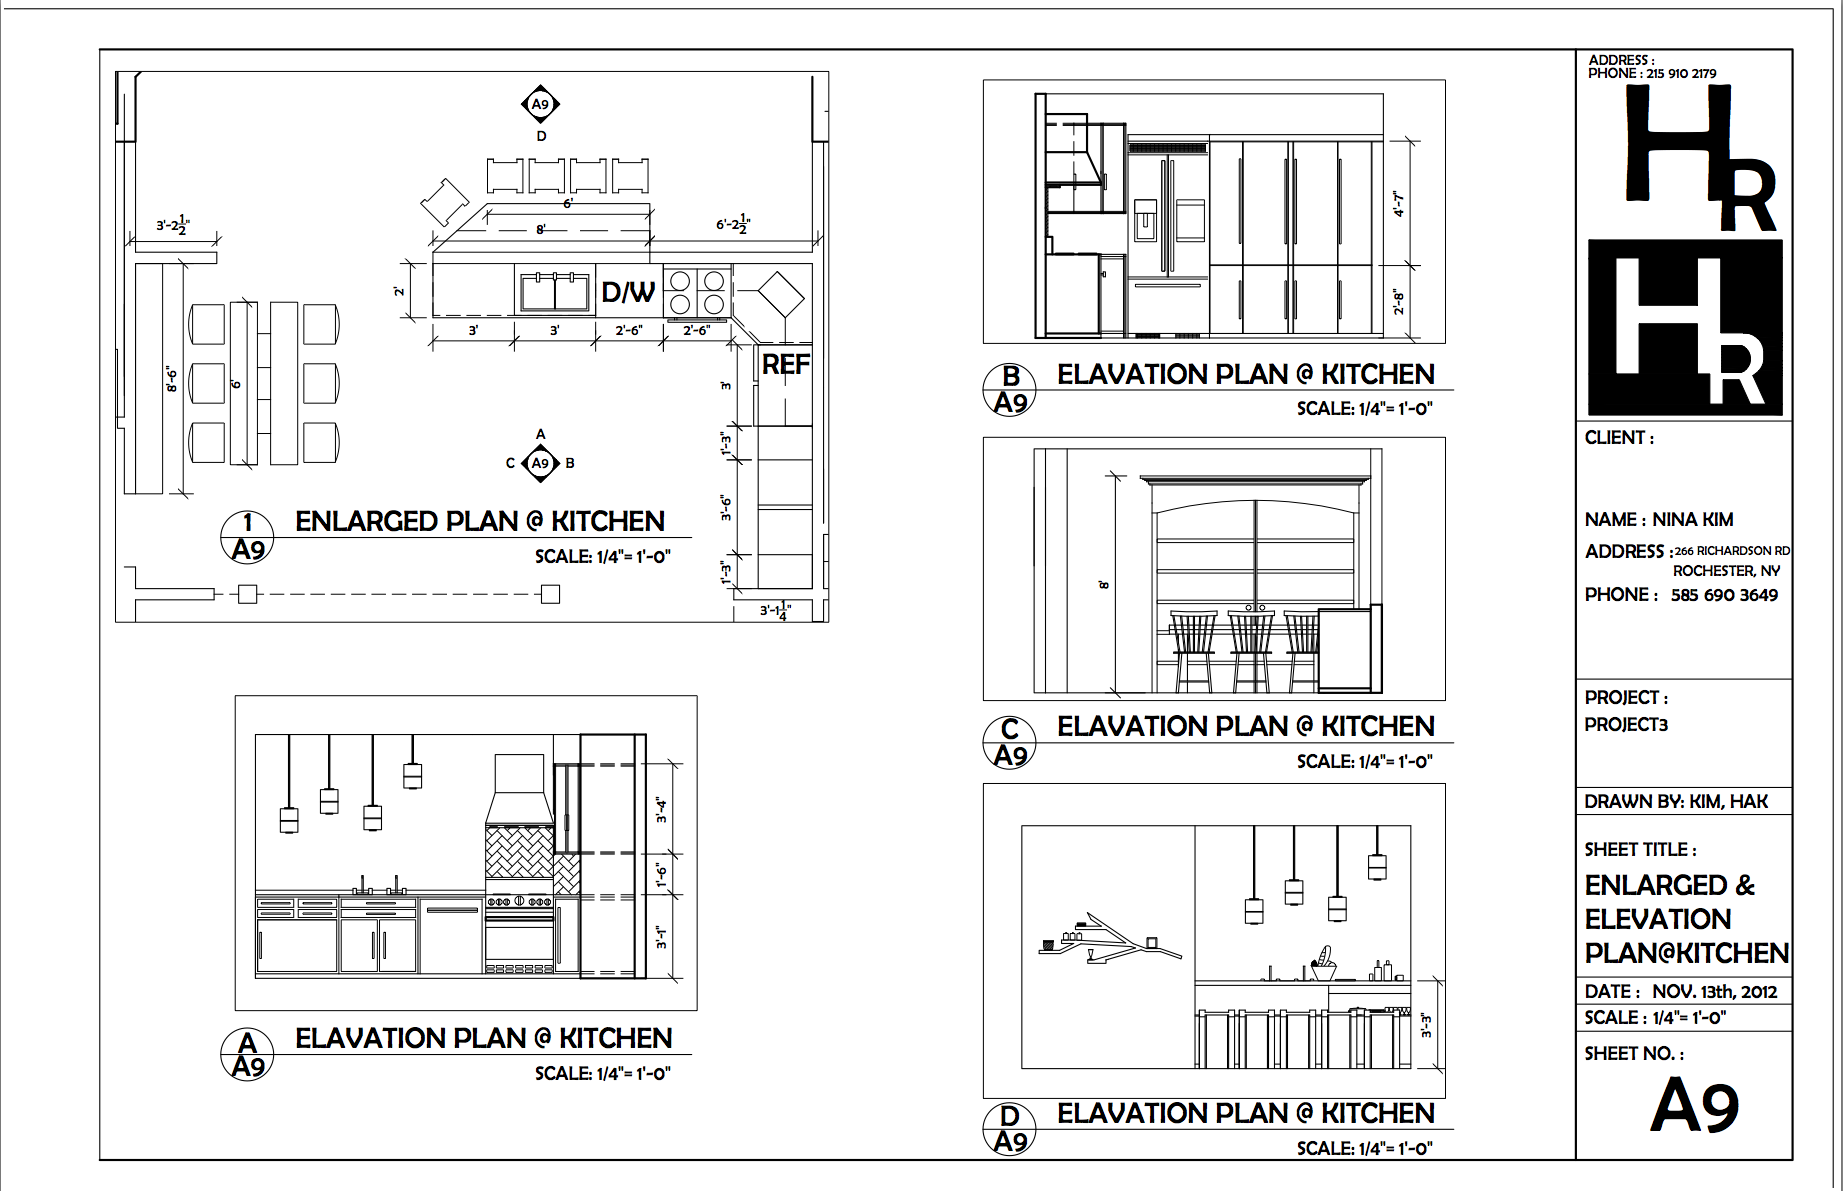 kitchen enlarged and elevation plan elevation plan autocad floor plans house floor plans [ 1843 x 1191 Pixel ]